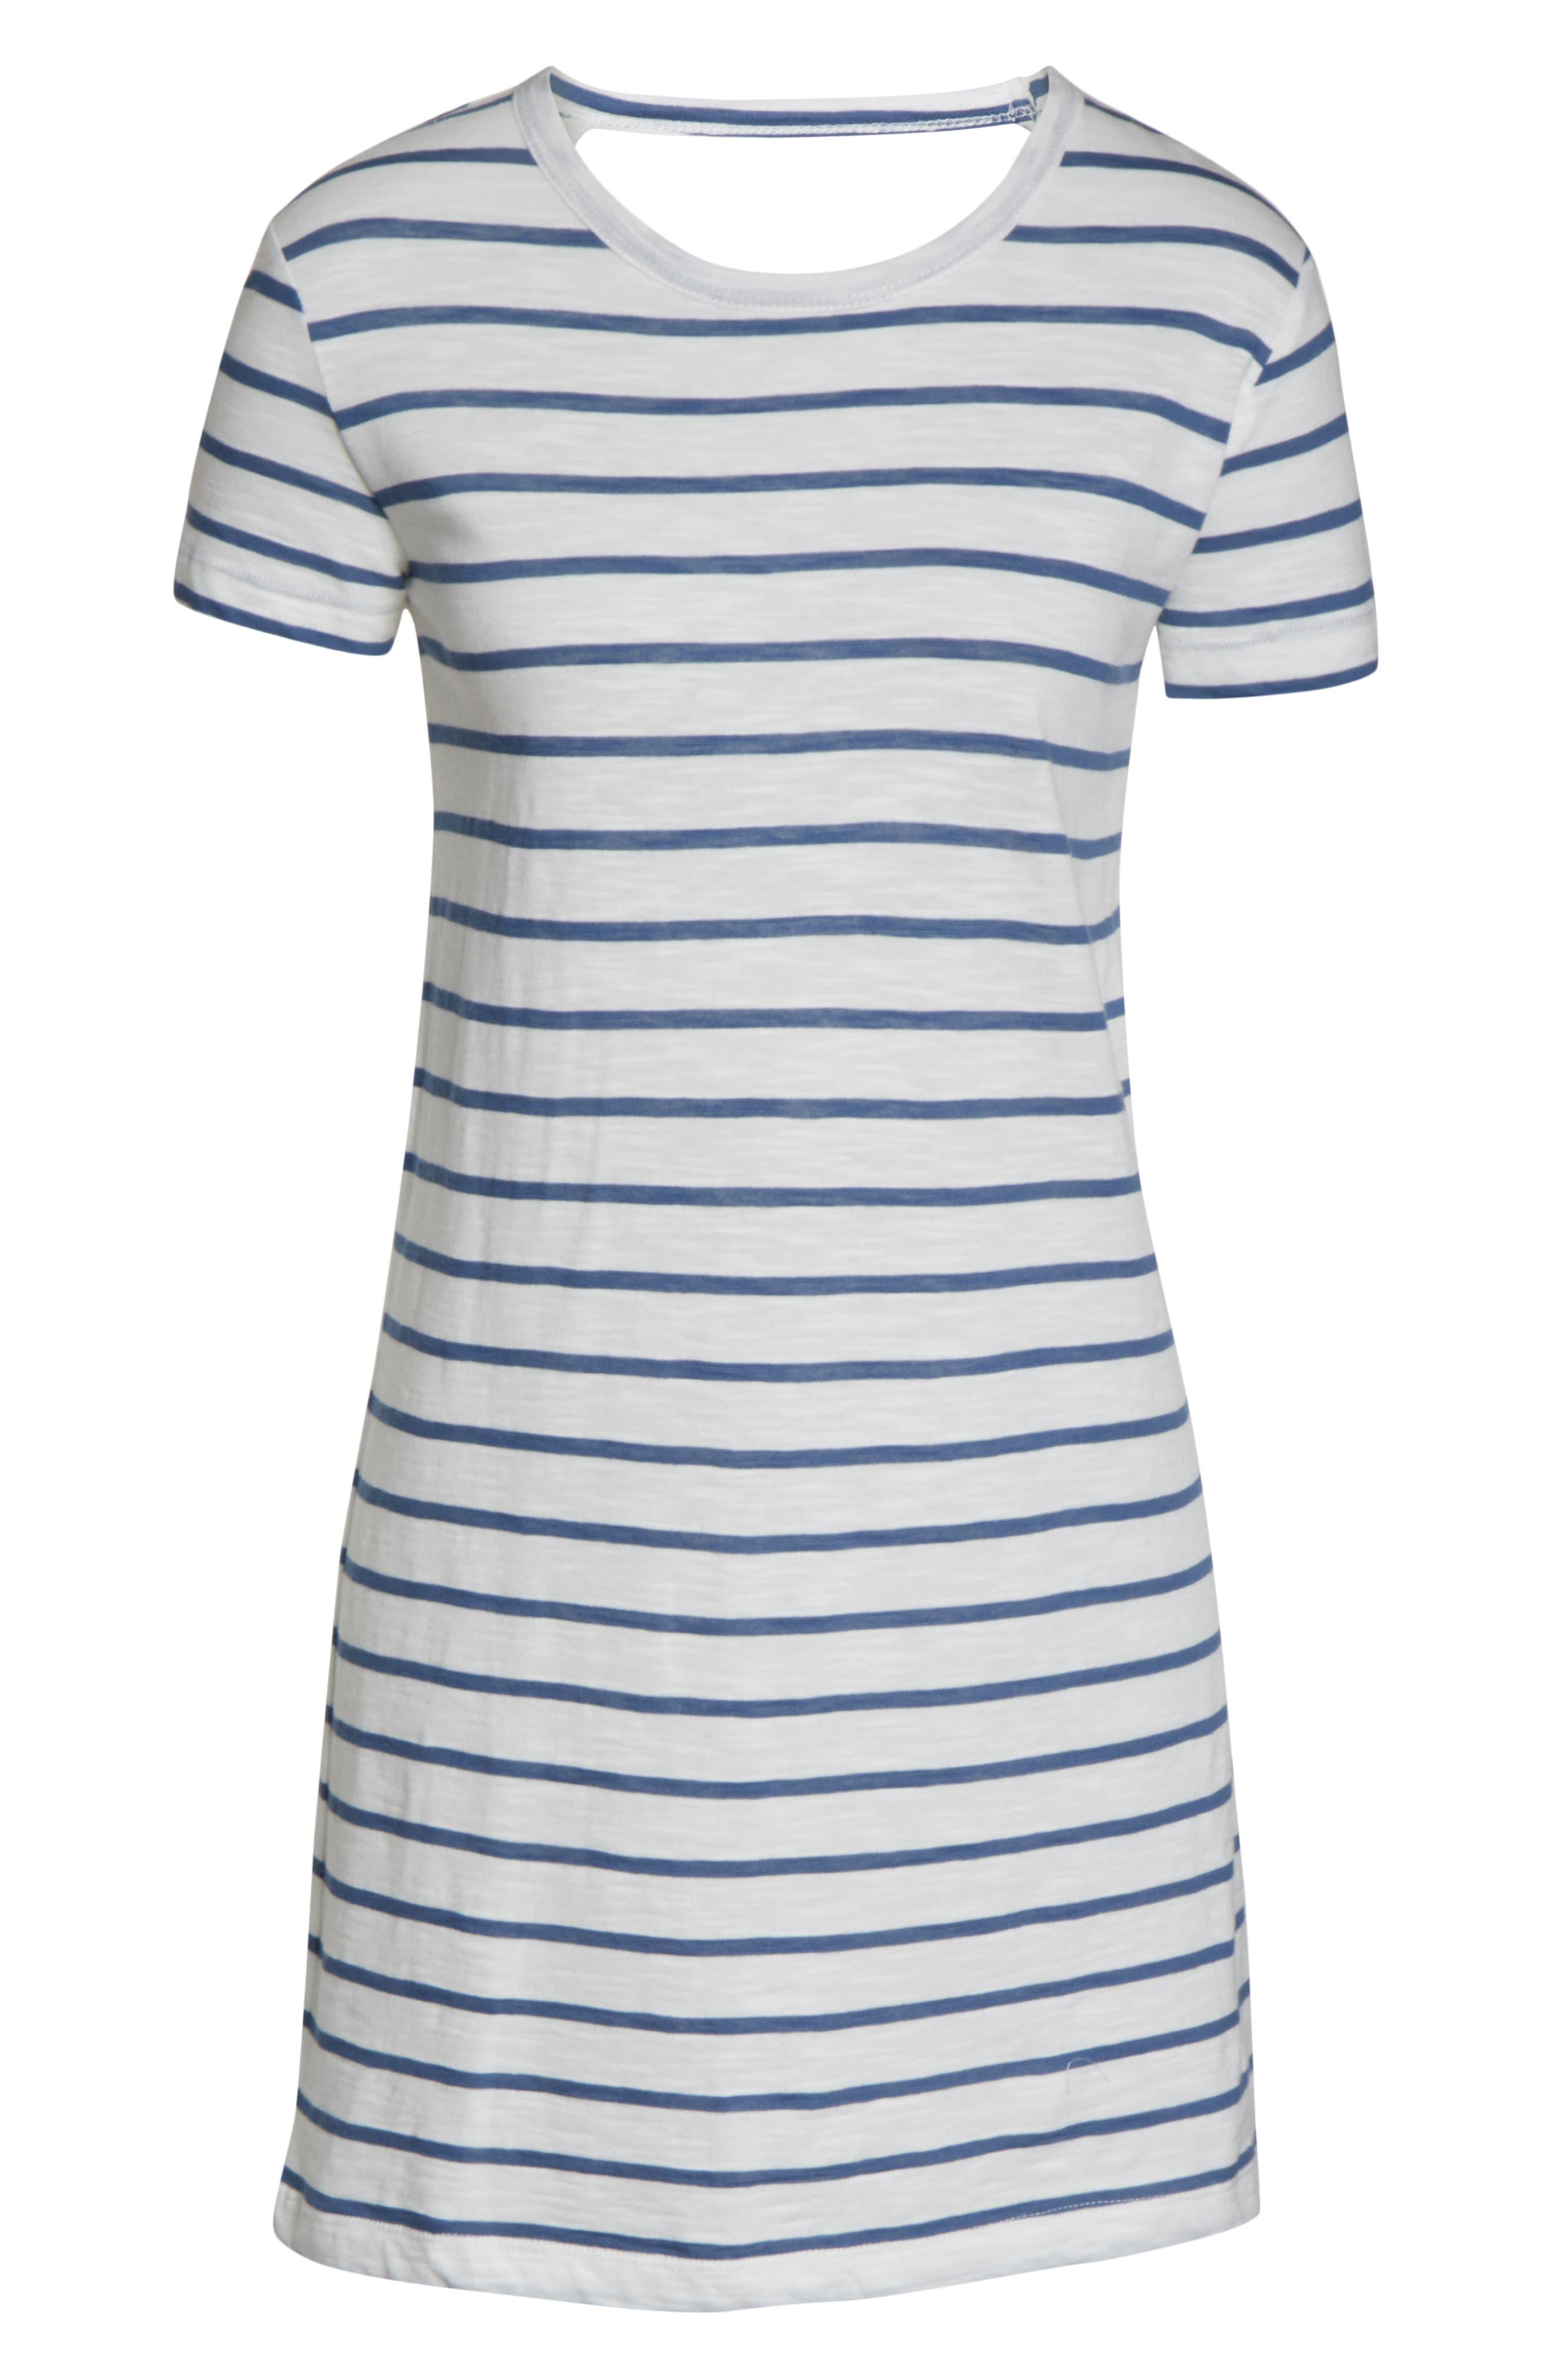 RIP CURL, Surf Essentials T-Shirt Dress, Alternate thumbnail 5, color, VANILLA